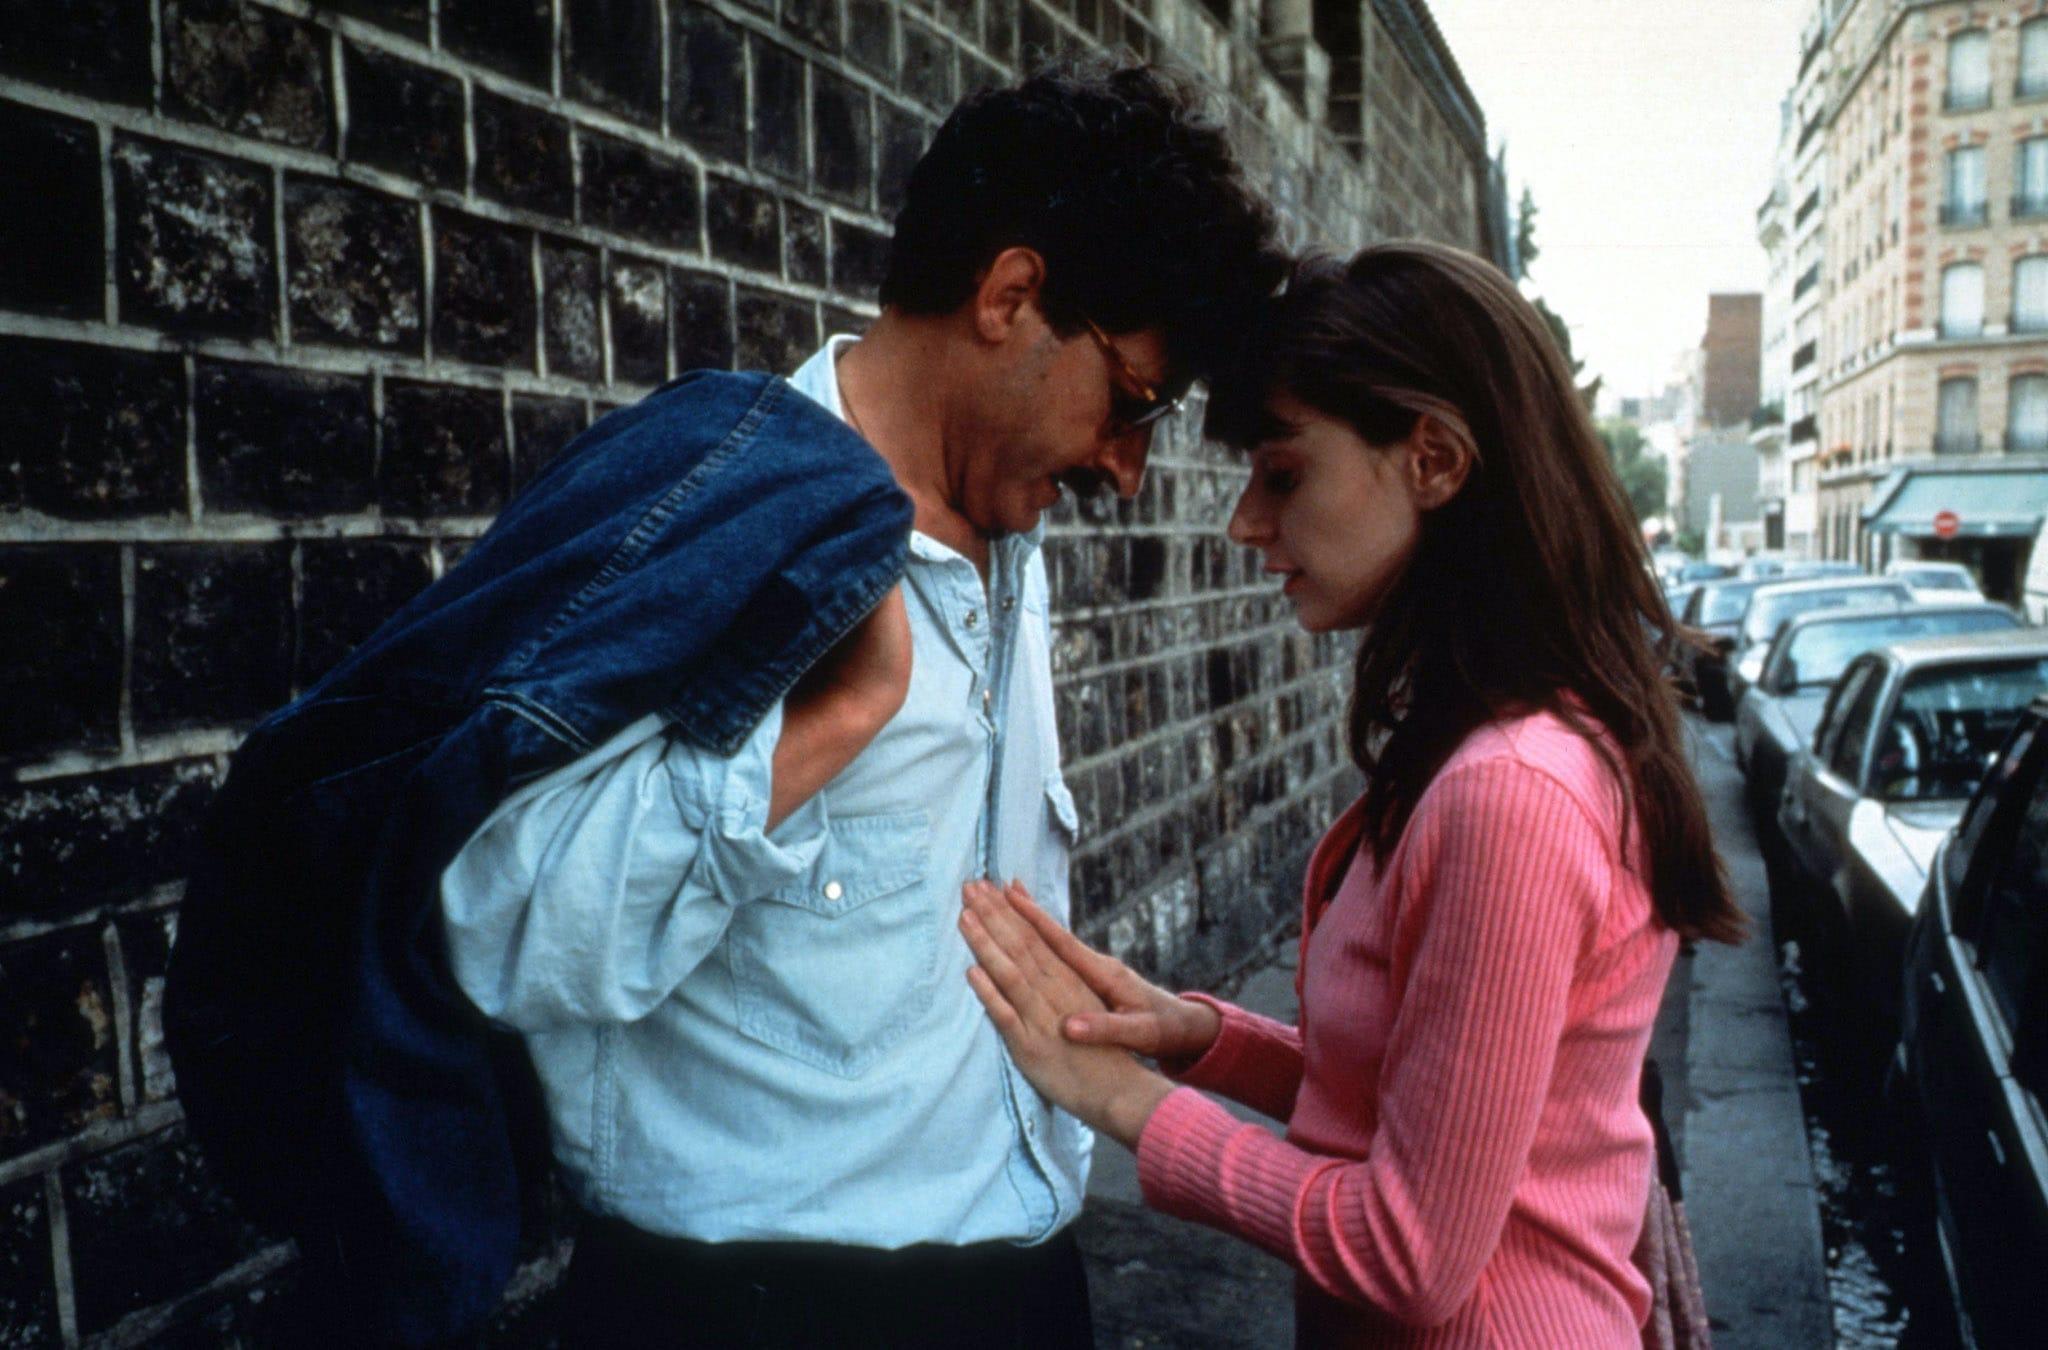 L.627 de Bertrand Tavernier image film cinéma